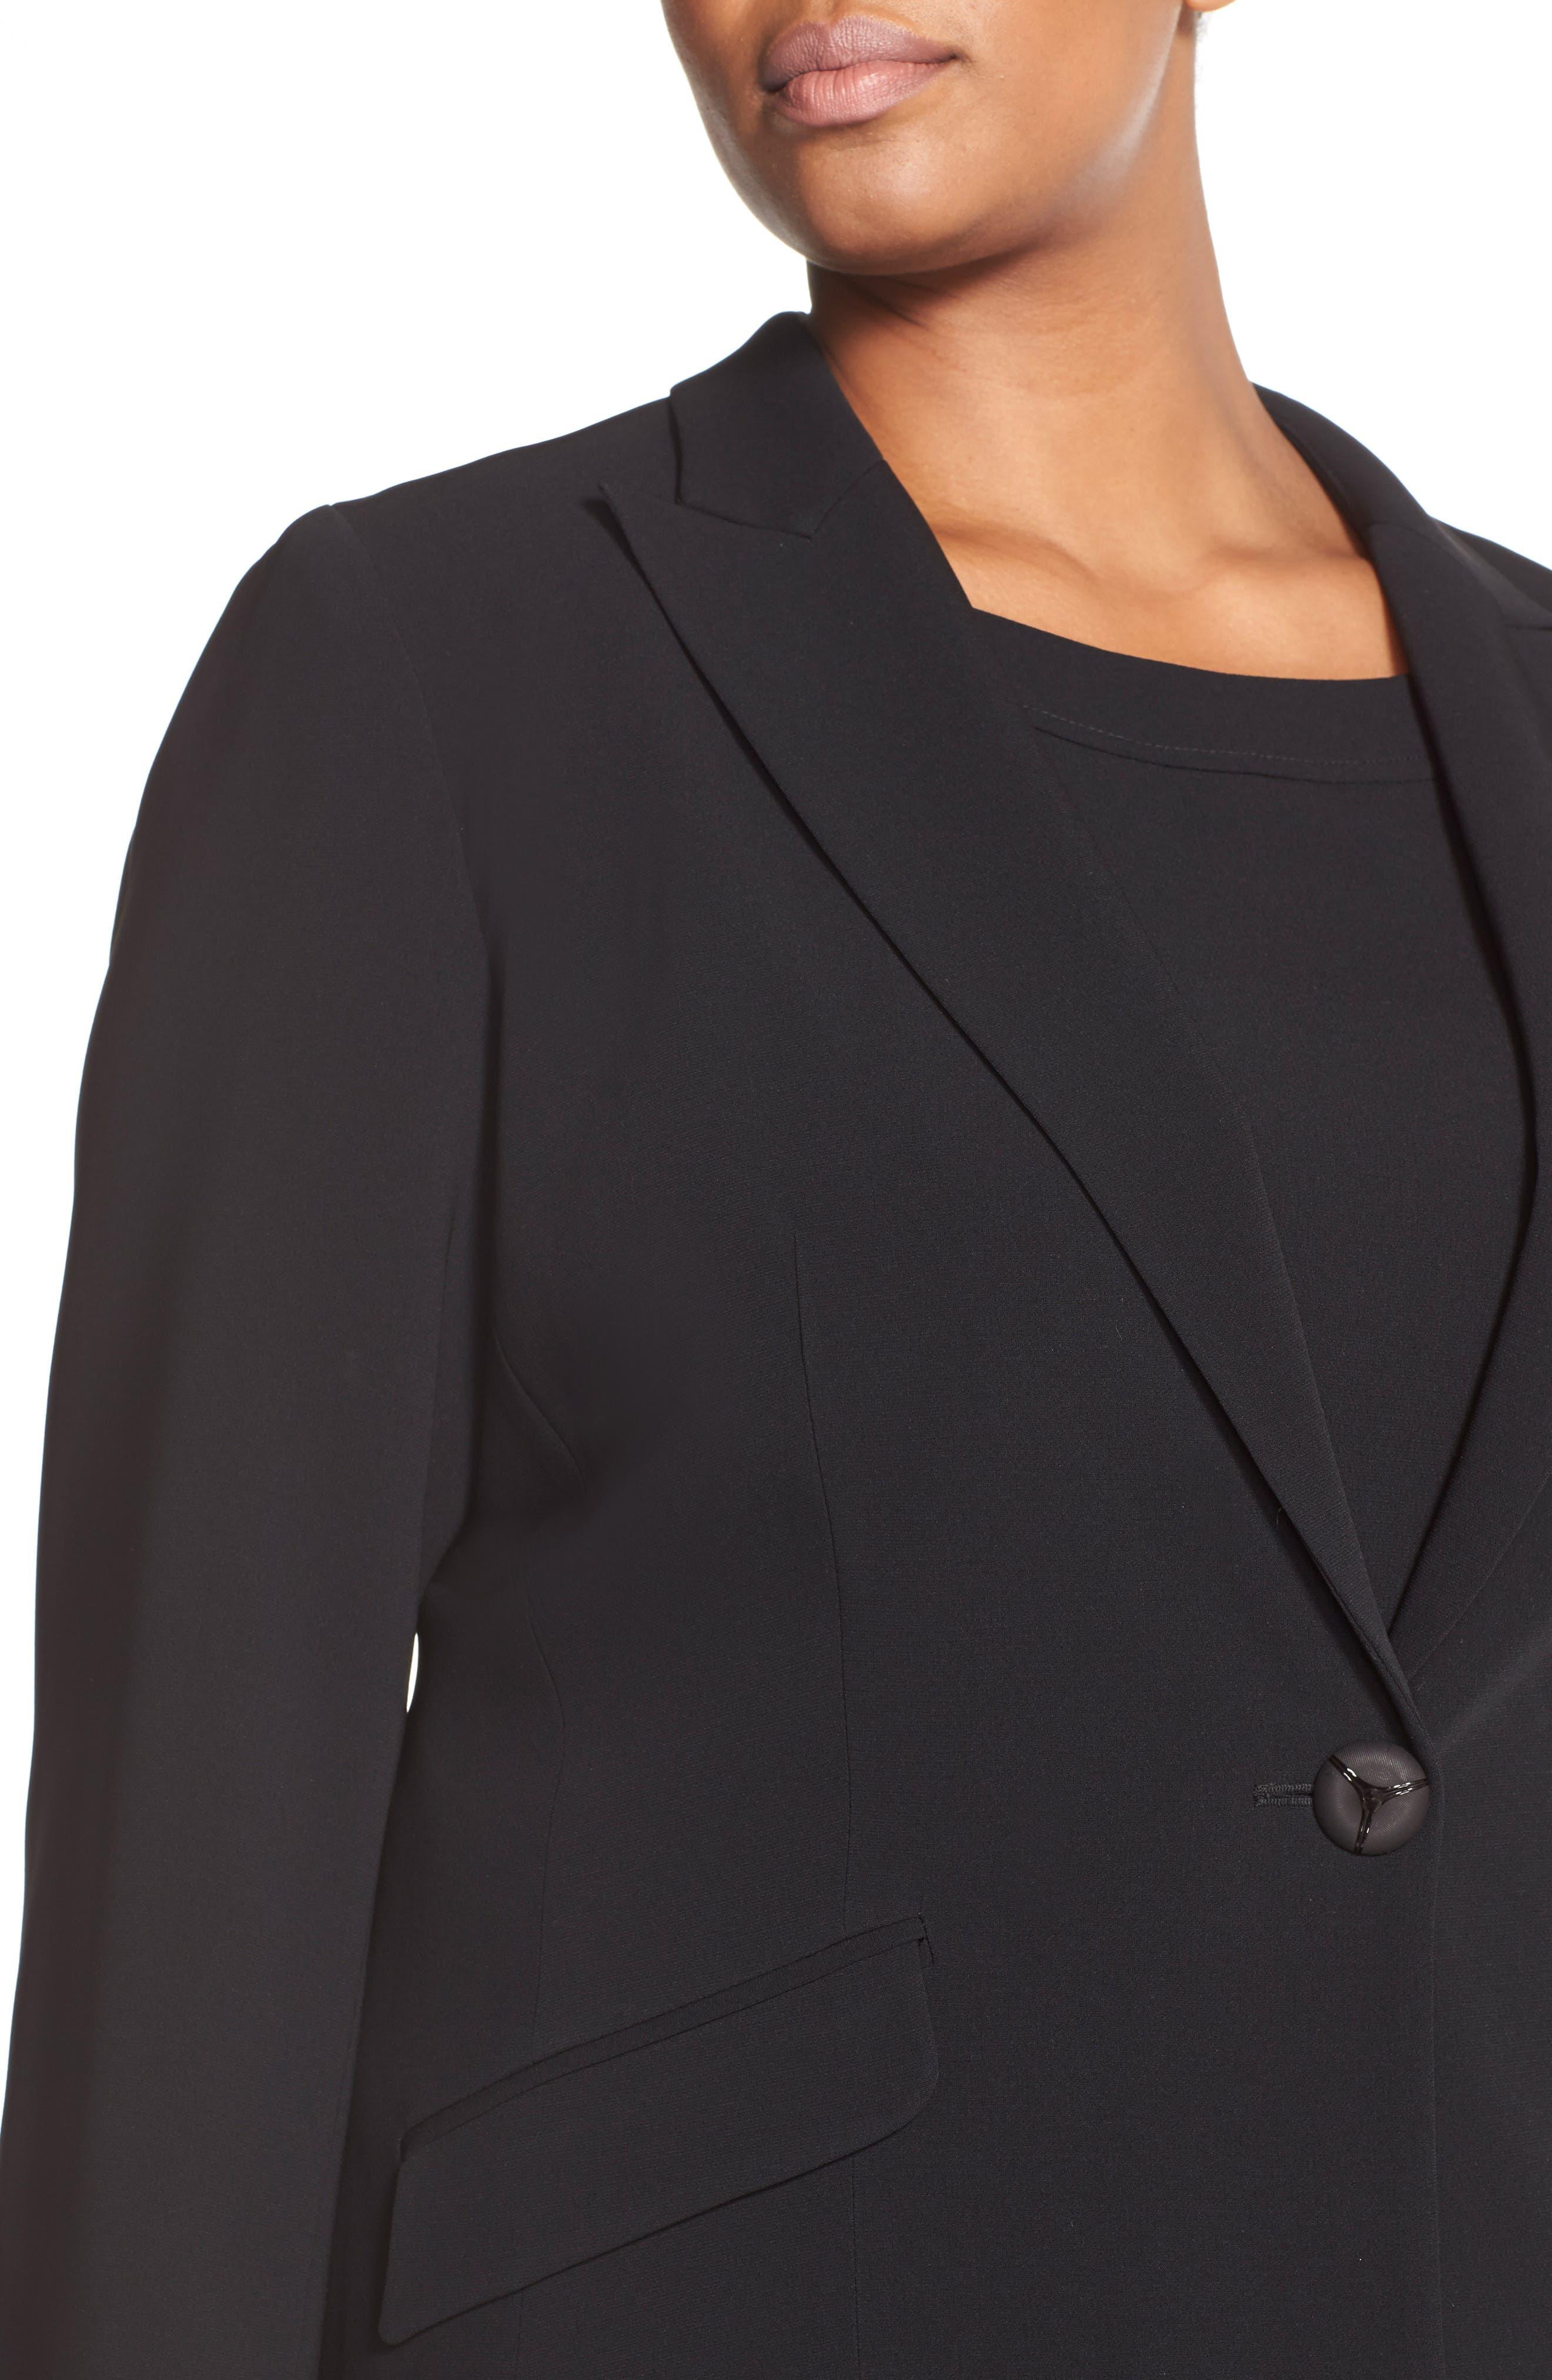 Sleeveless Suiting Sheath Dress,                             Alternate thumbnail 6, color,                             Black